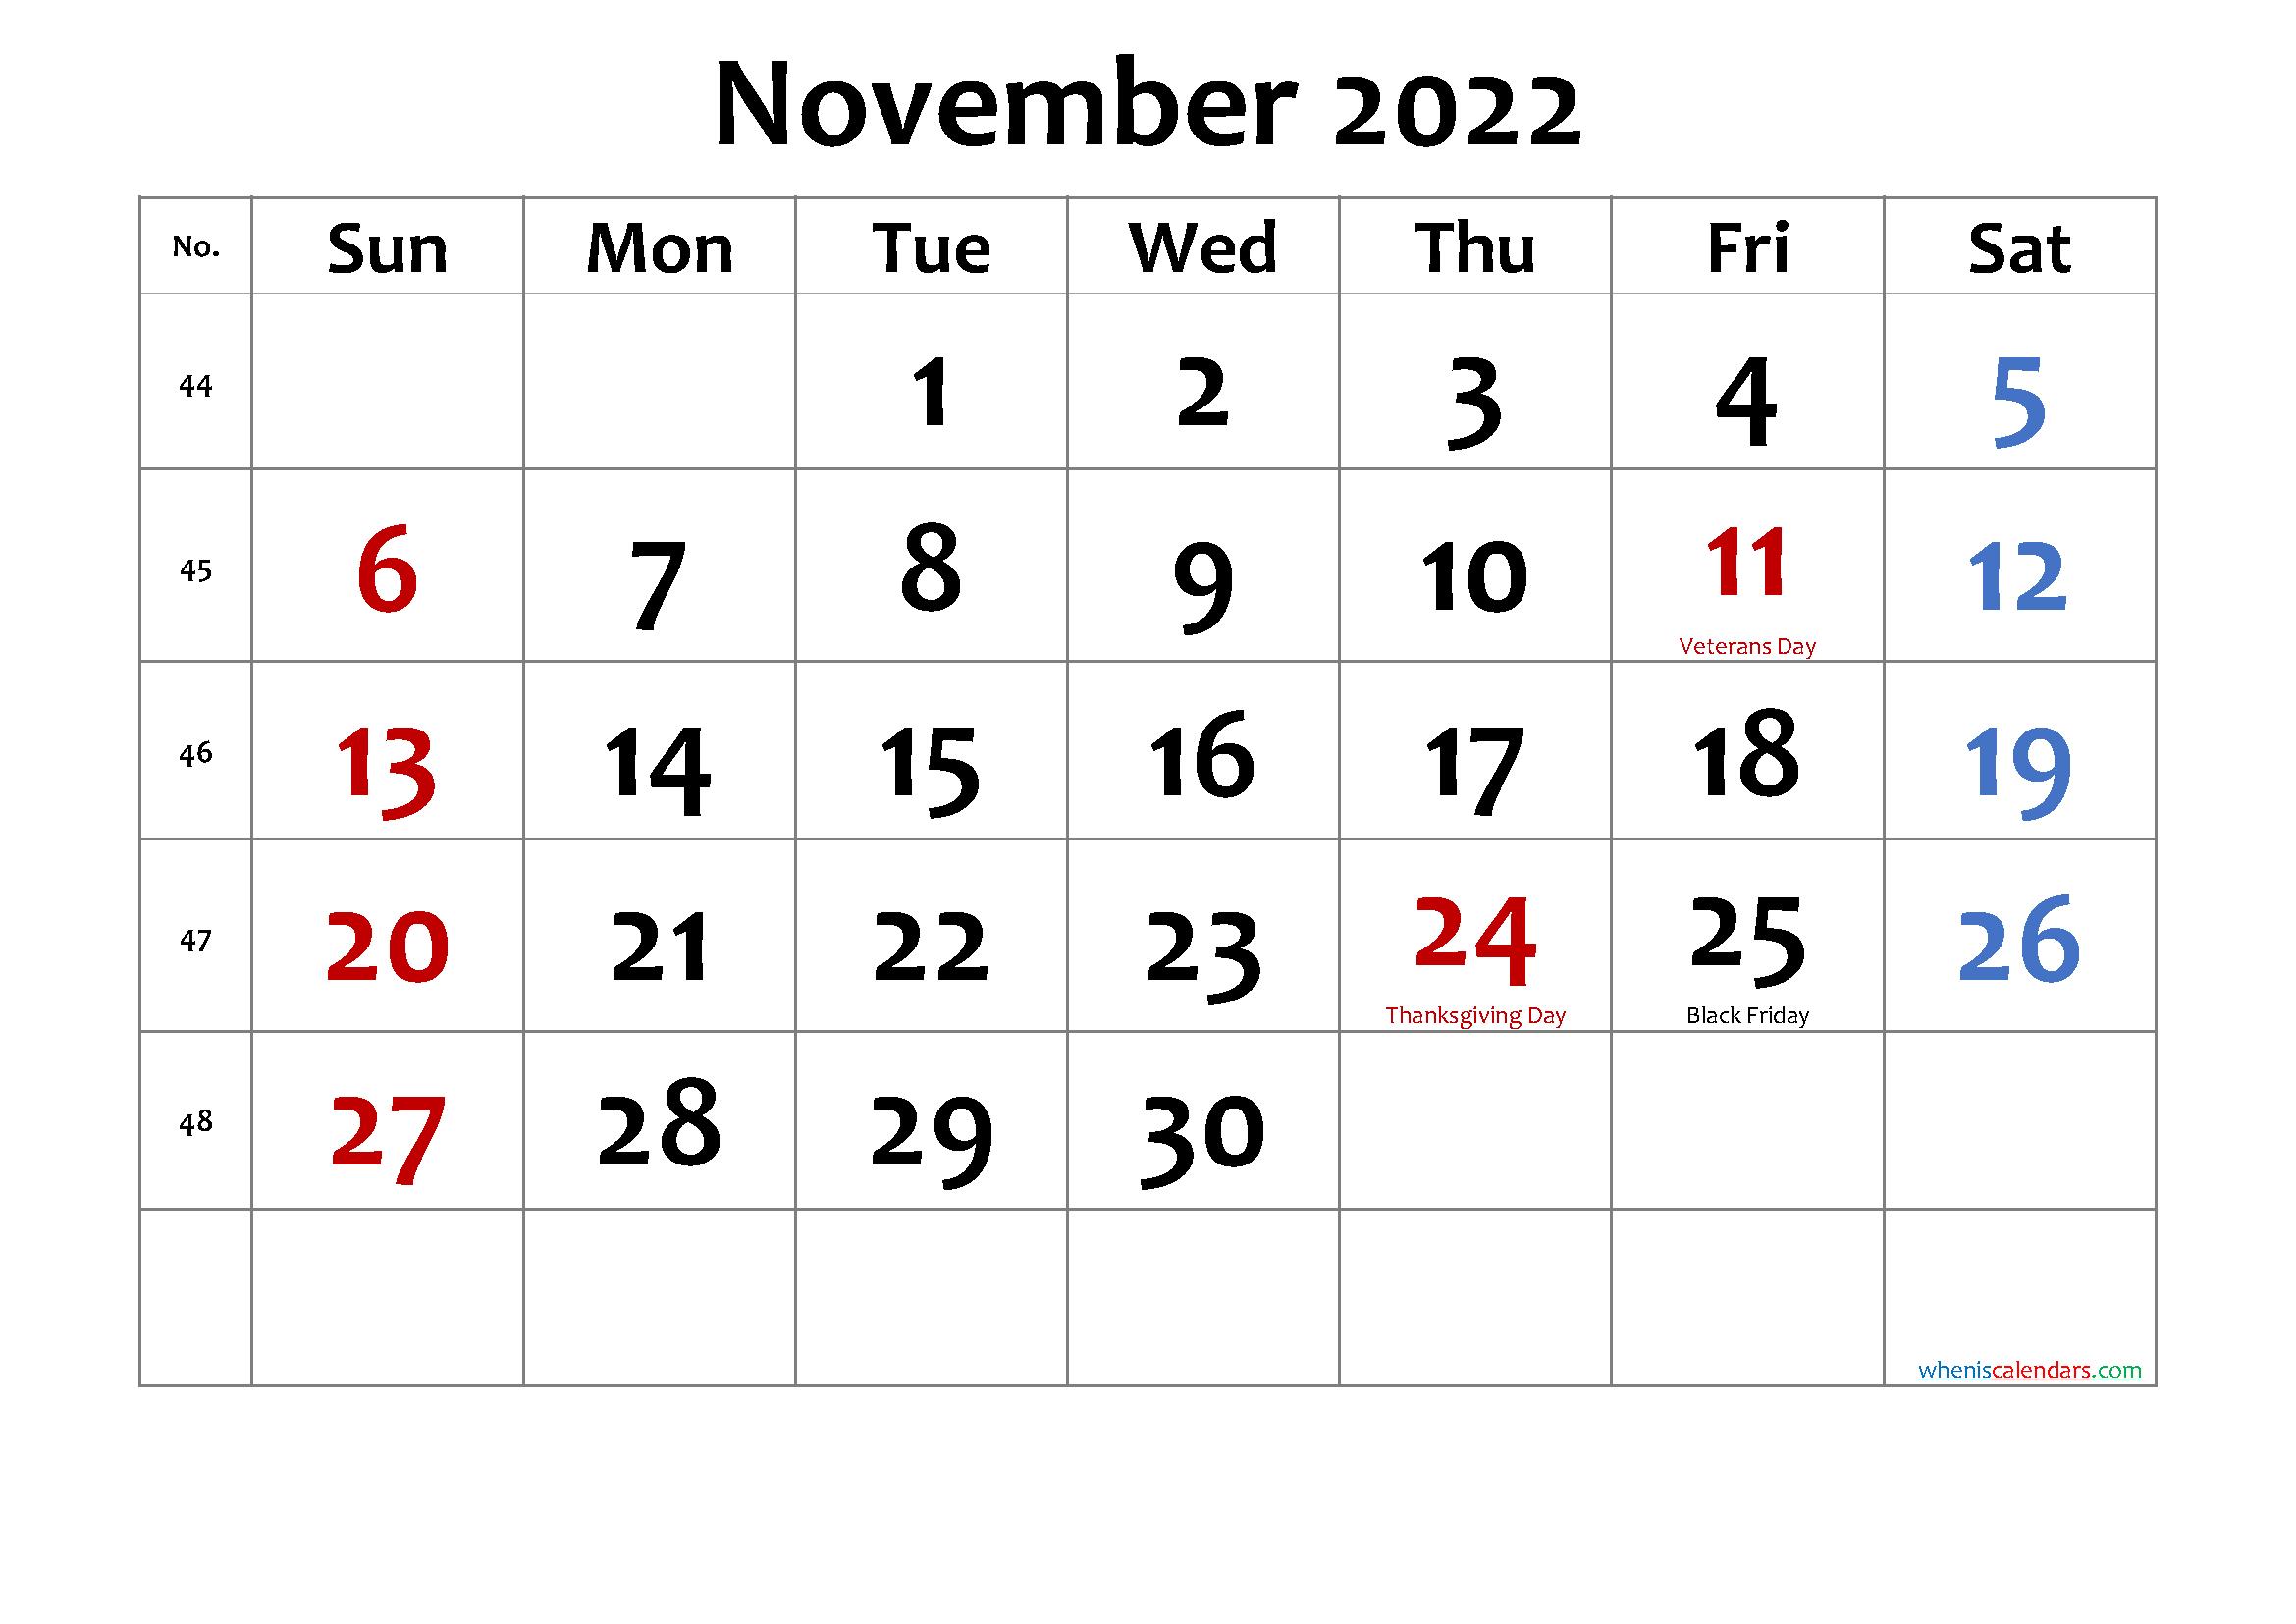 November 2022 Printable Calendar With Holidays pertaining to November 2022 Calendar Planner Printable Photo